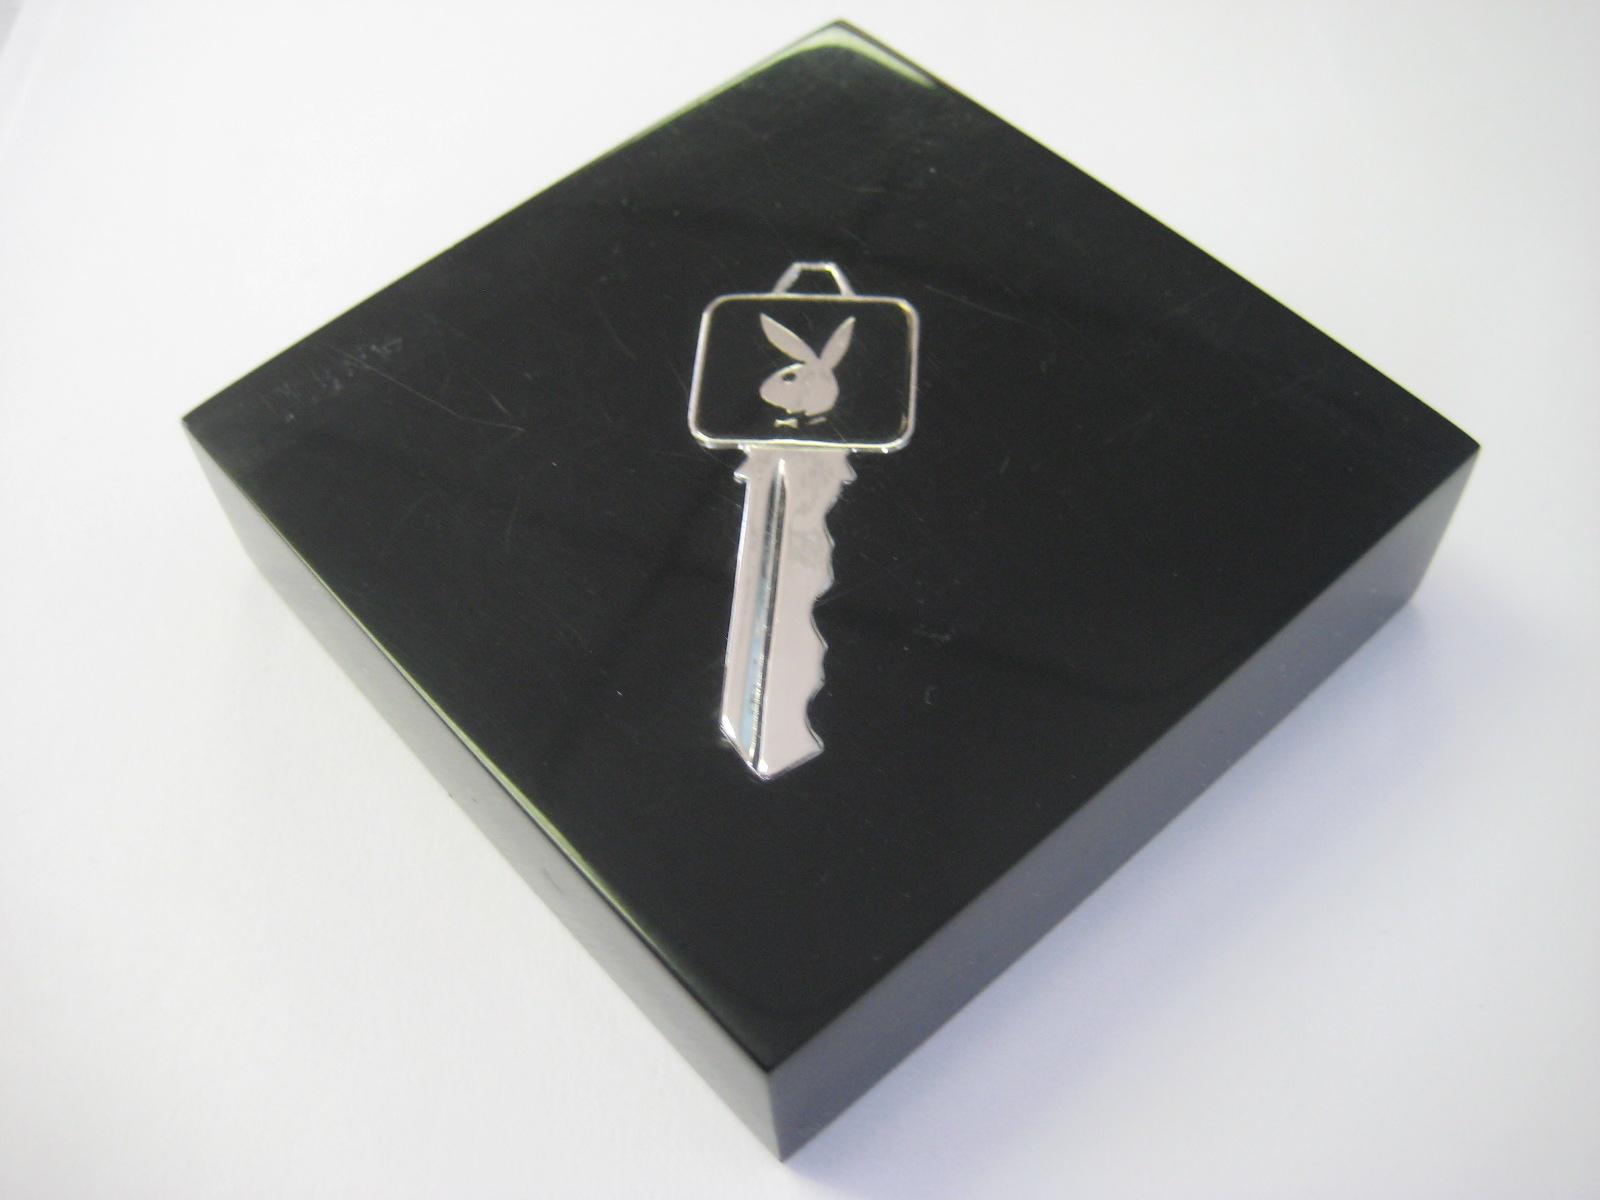 Playboy Club Key Paper Weight